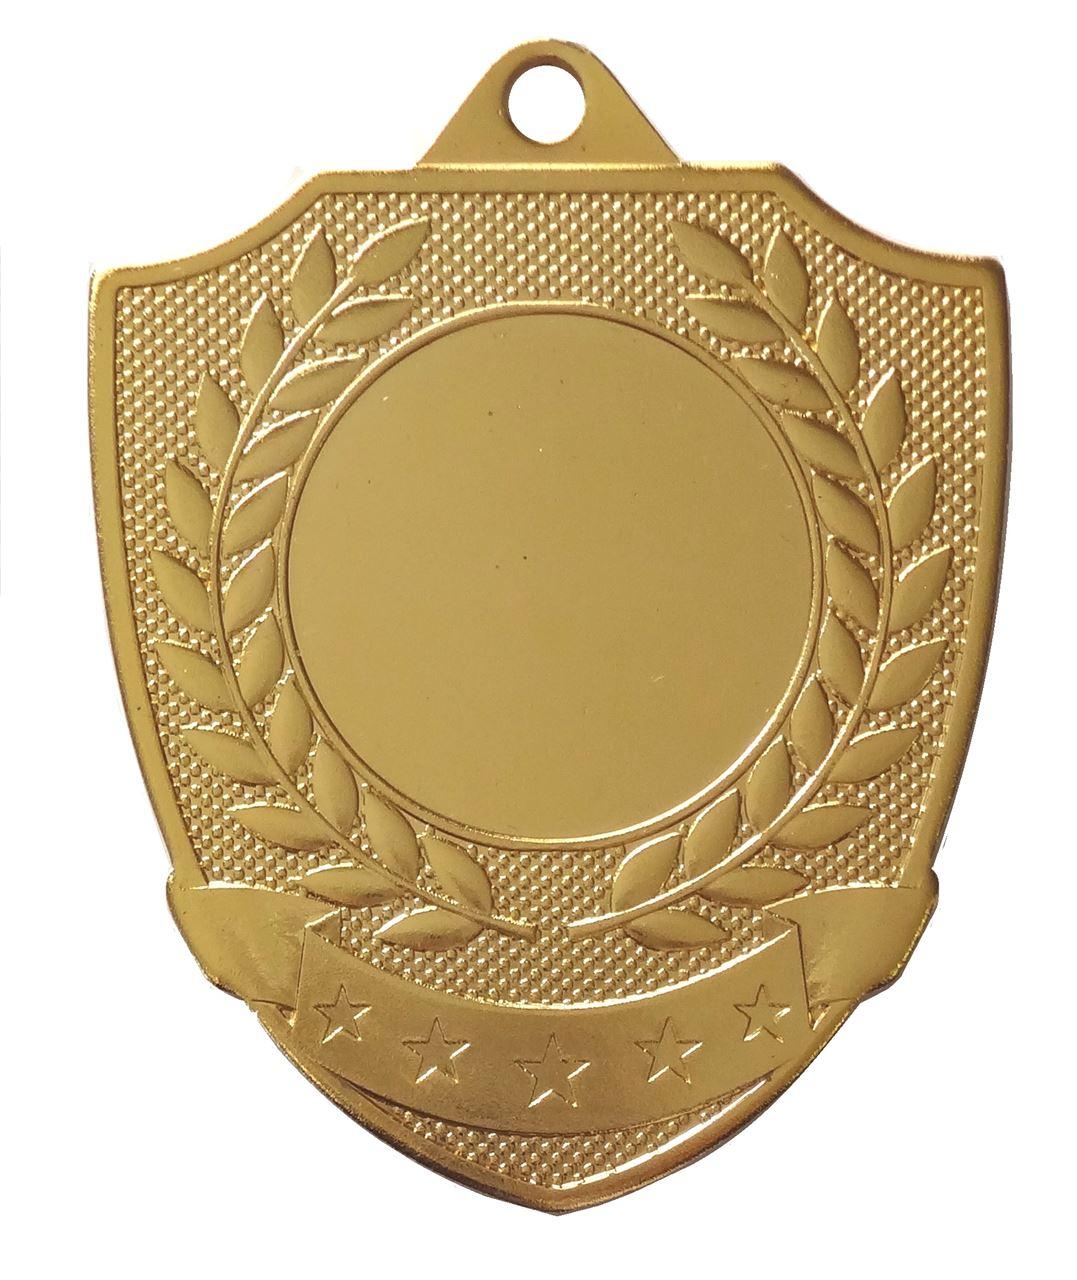 economy shield medal 65872 impact trophies